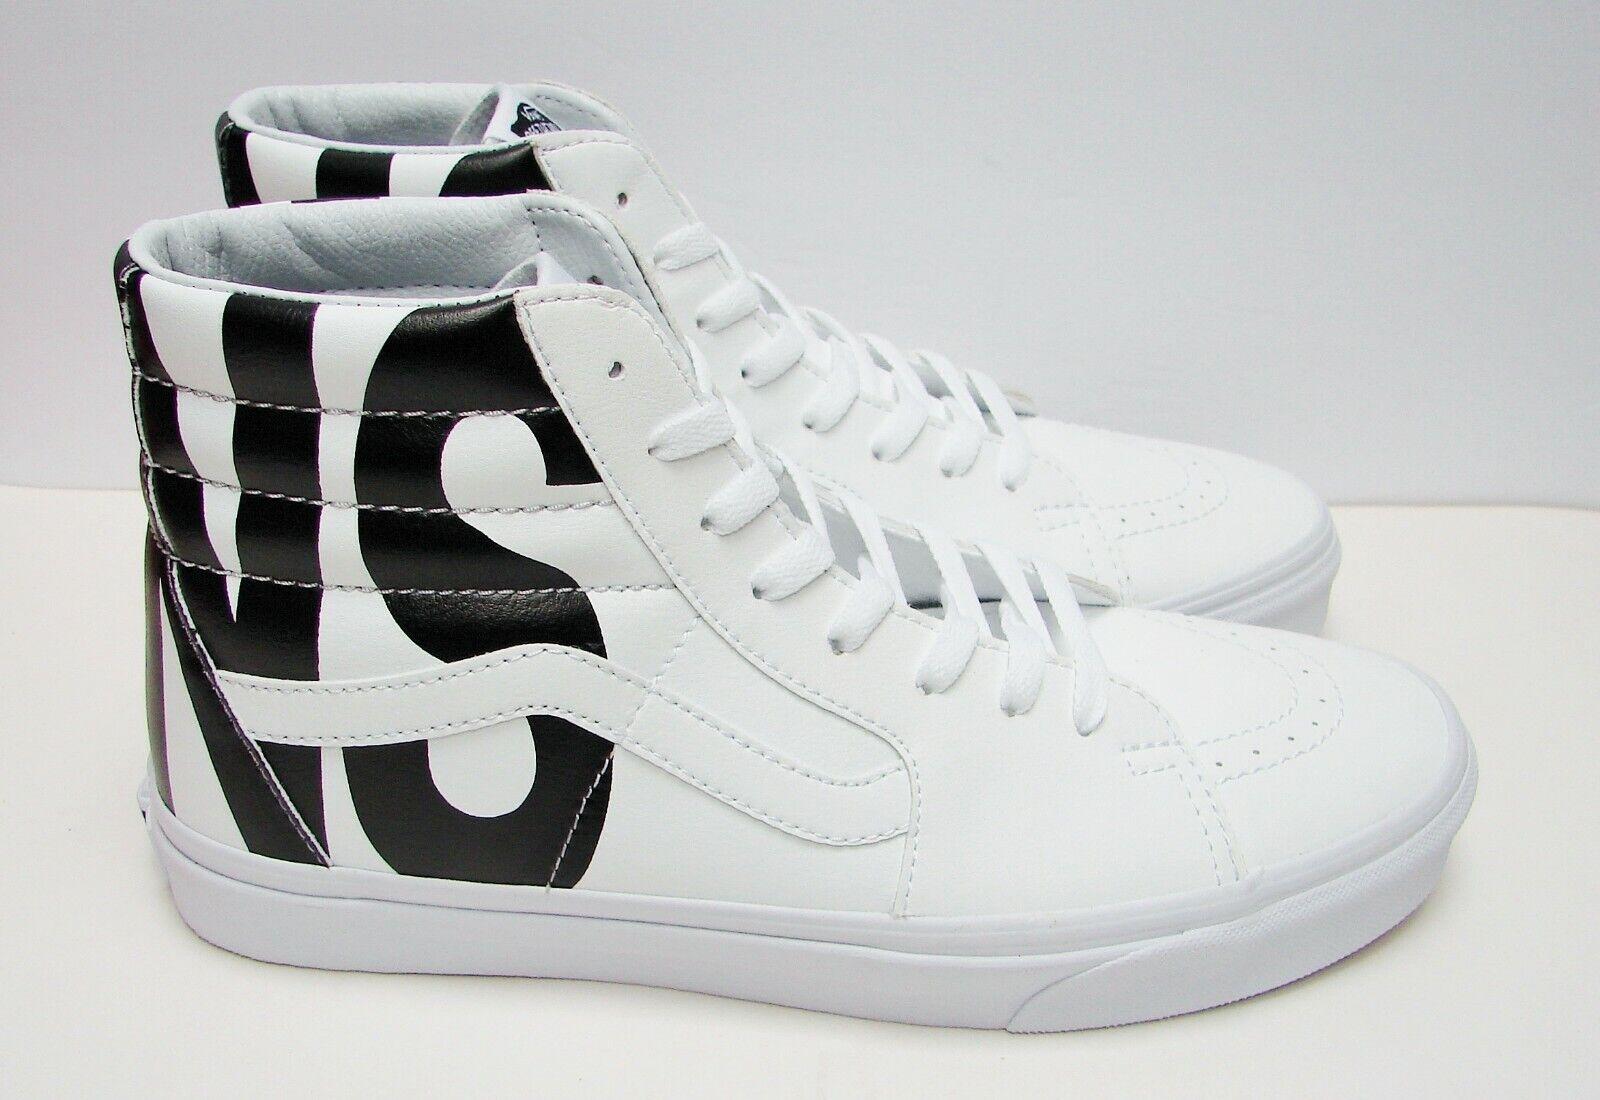 VANS SK8-HI (Classic Tumble) True White VN-0A38GEUBD Men's size  10